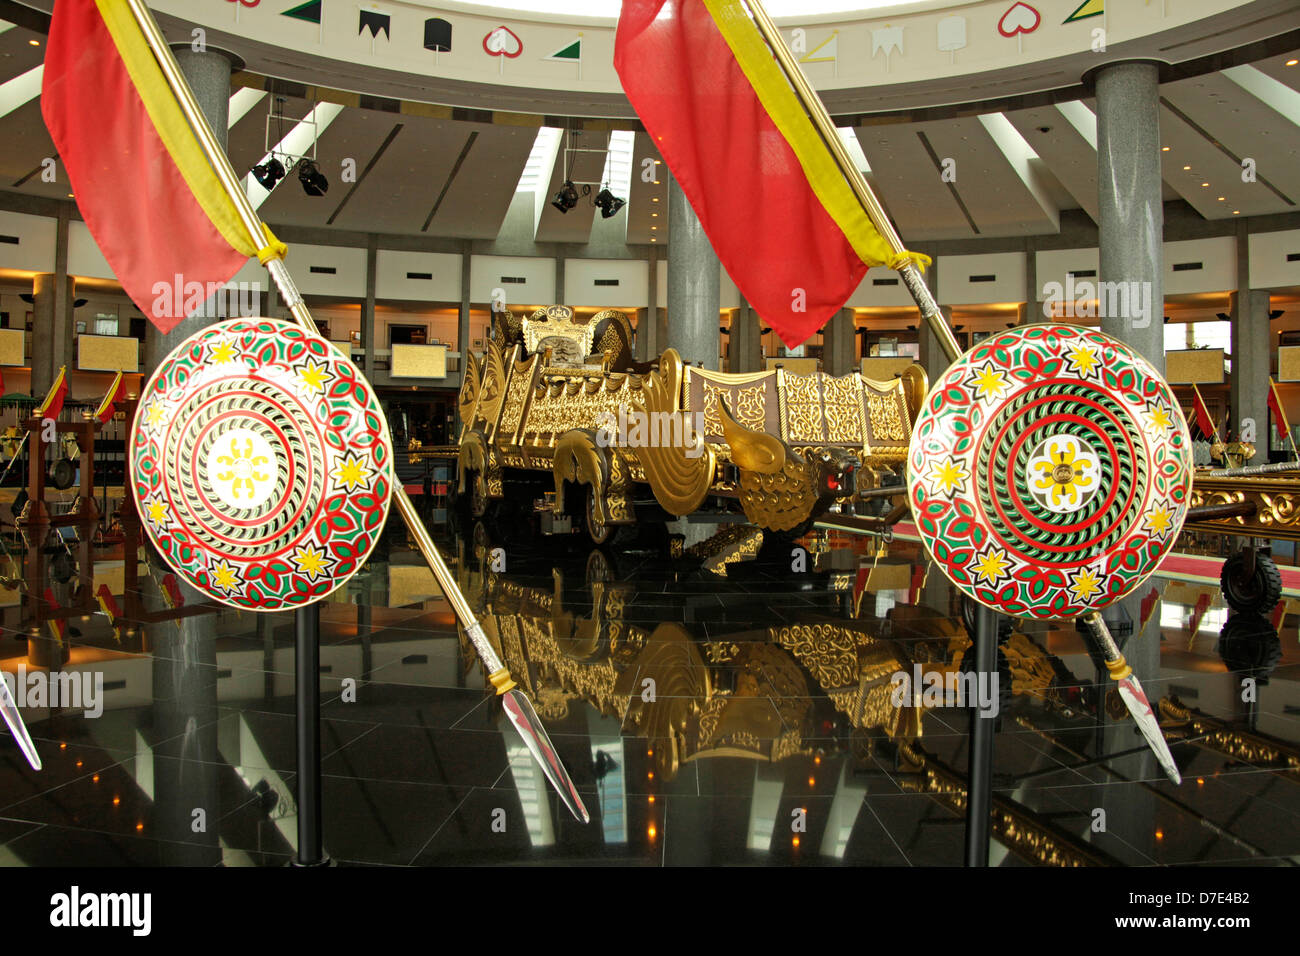 BRN, BRUNEI DARUSSALAM, Bandar Seri Begawan, 14.03.2009: Silver Jubilee Chariot in the Royal Treasury, Royal Regalia - Stock Image